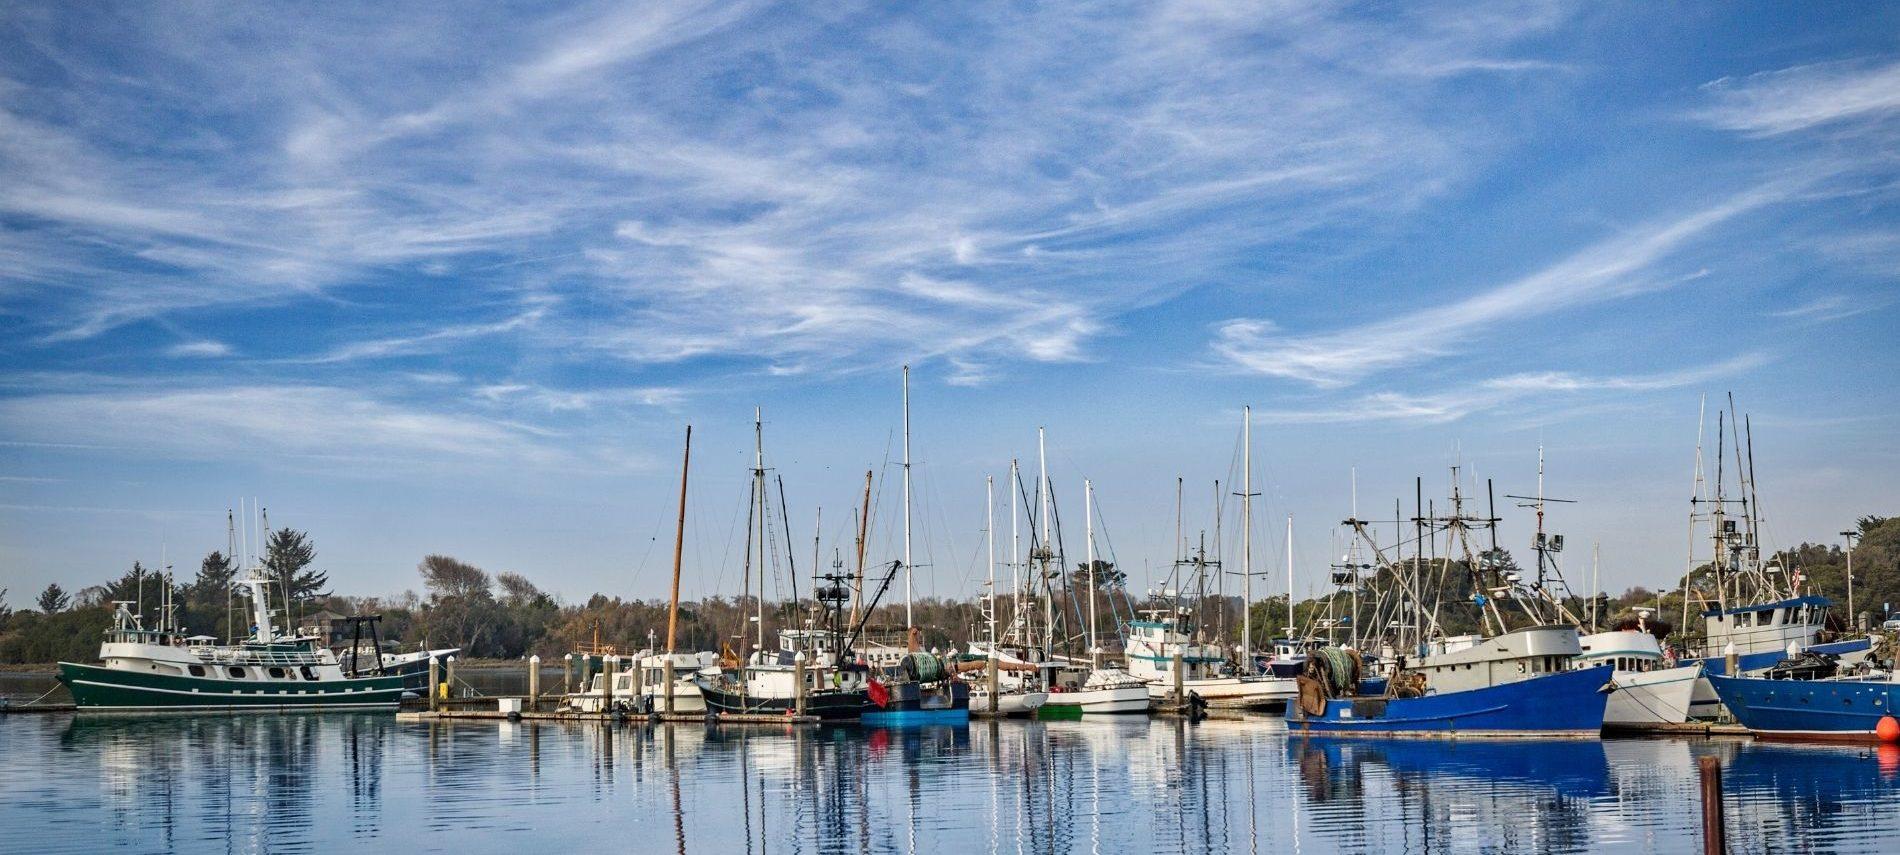 Boats in a harbor in Eureka CA